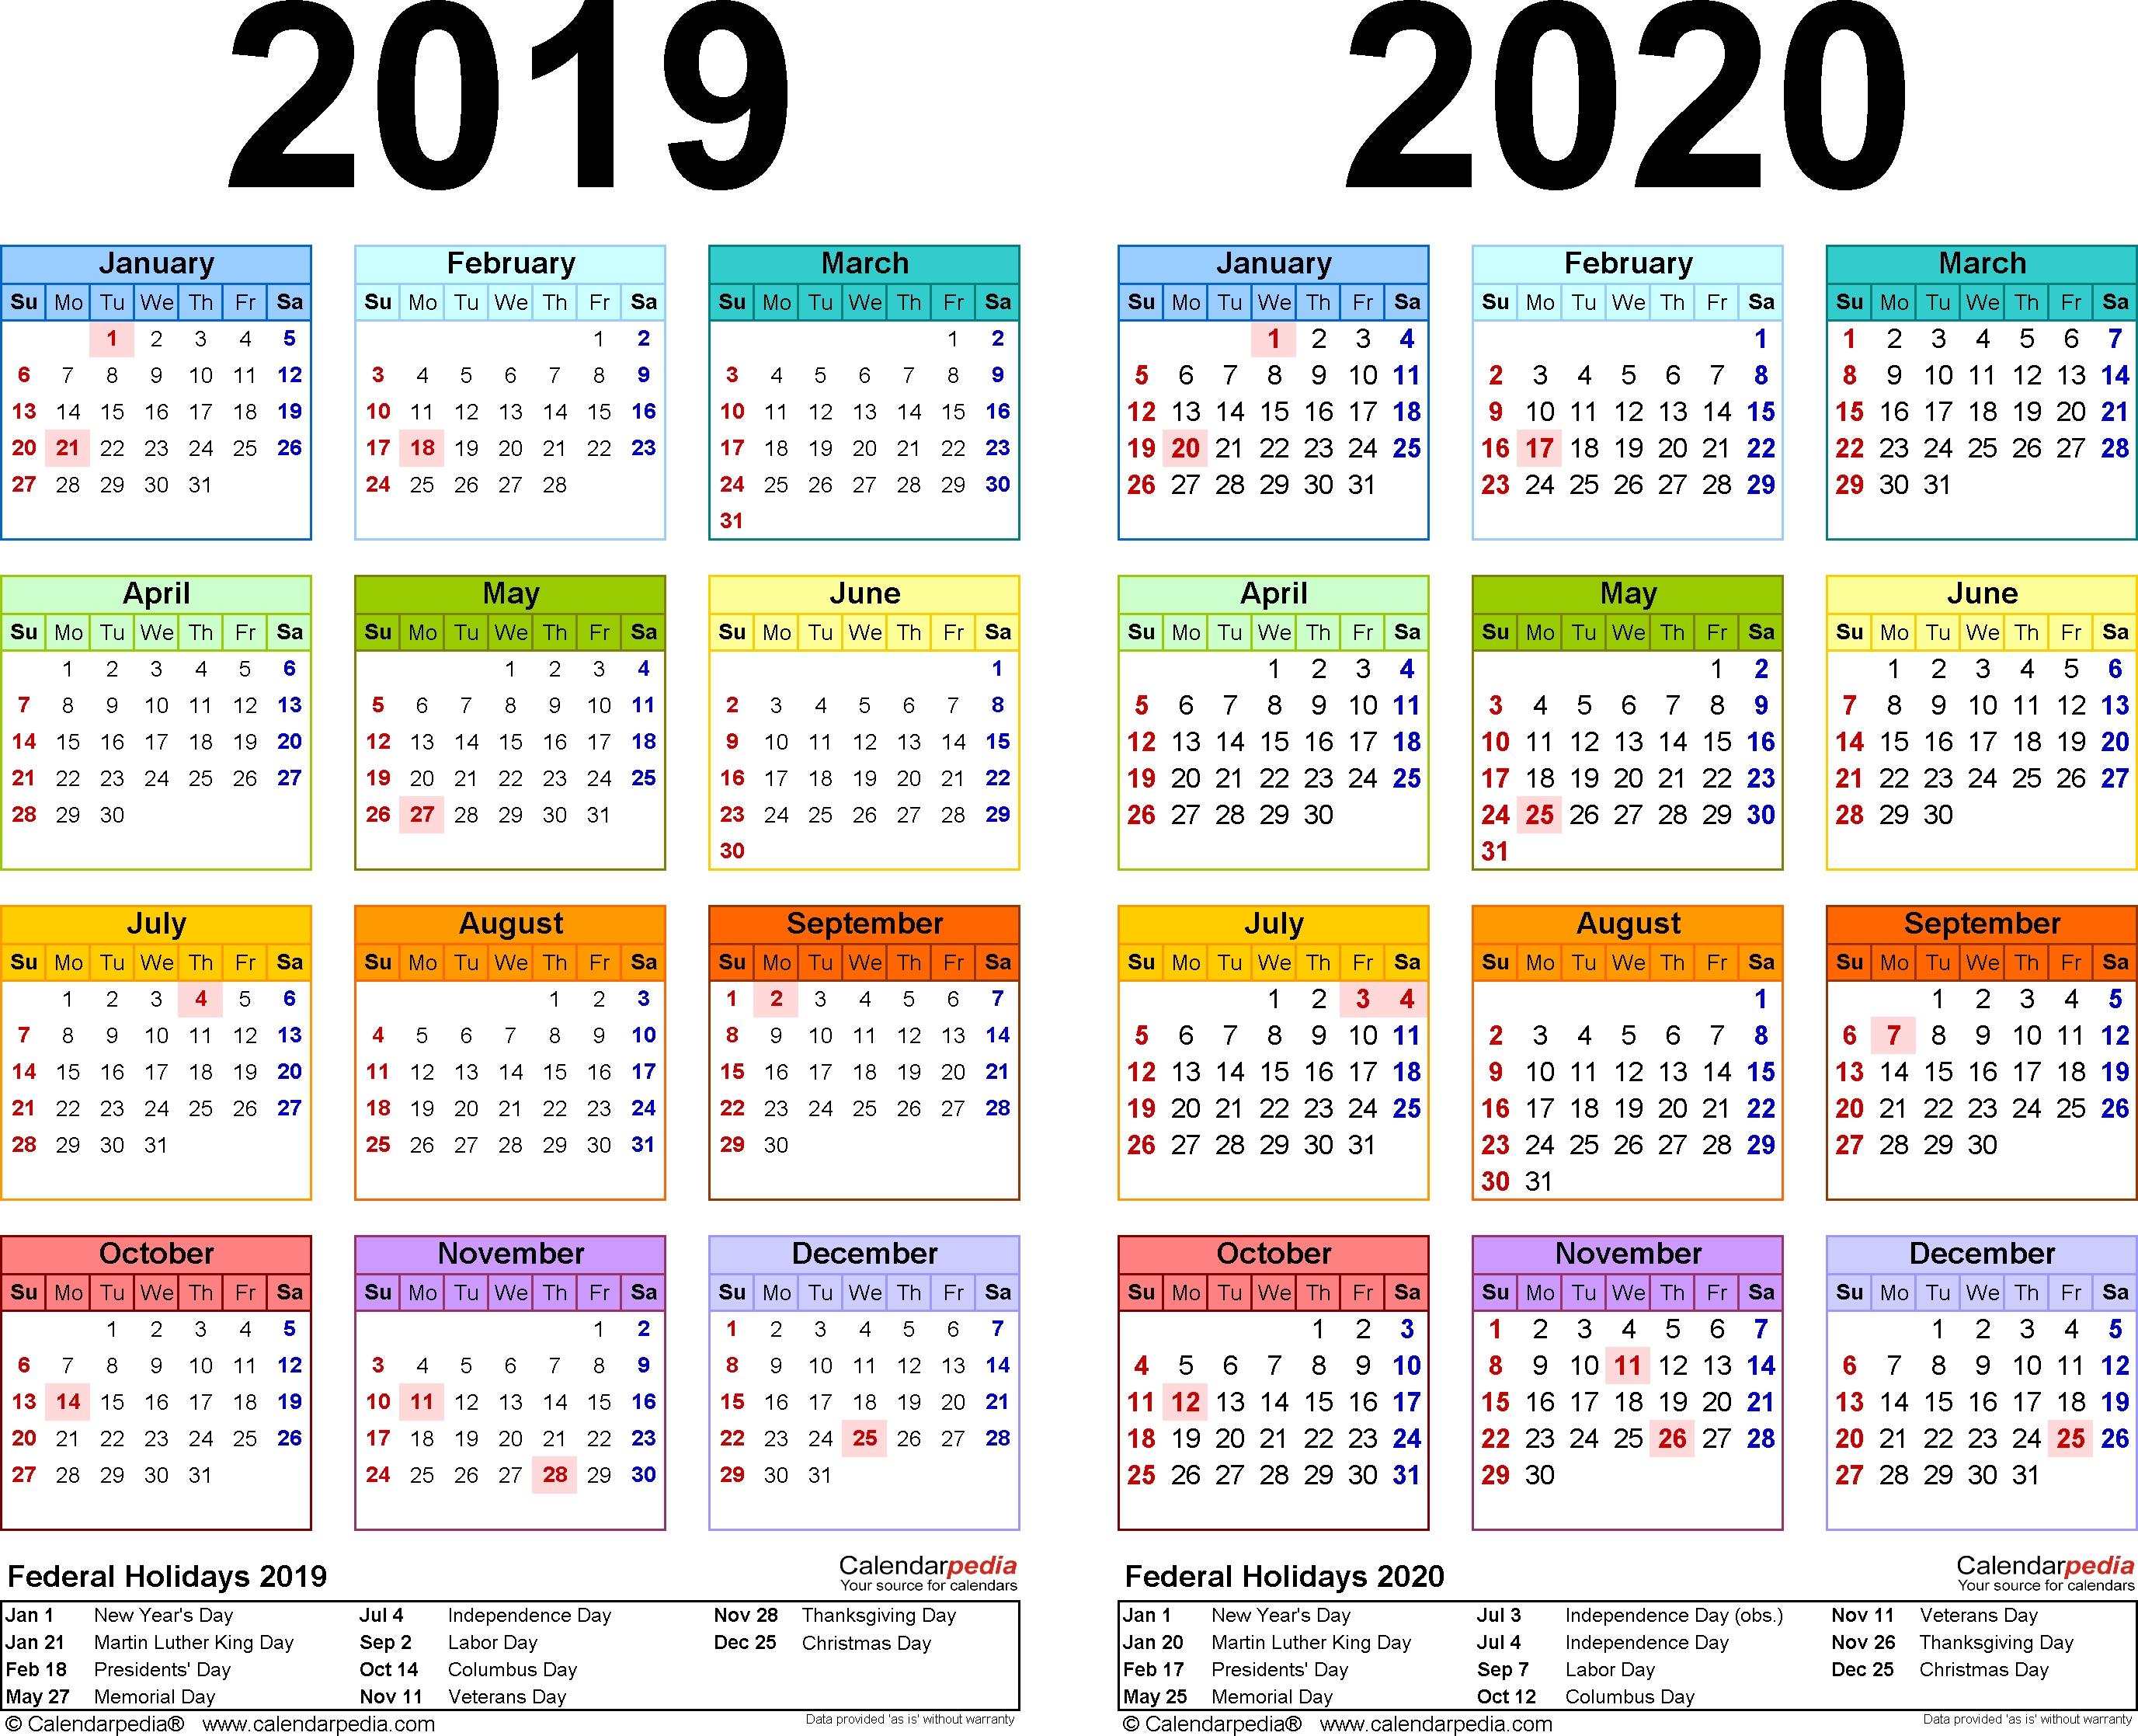 2019-2020 Calendar - Free Printable Two-Year Pdf Calendars throughout Printable Fill In Calendar 2019 - 2020